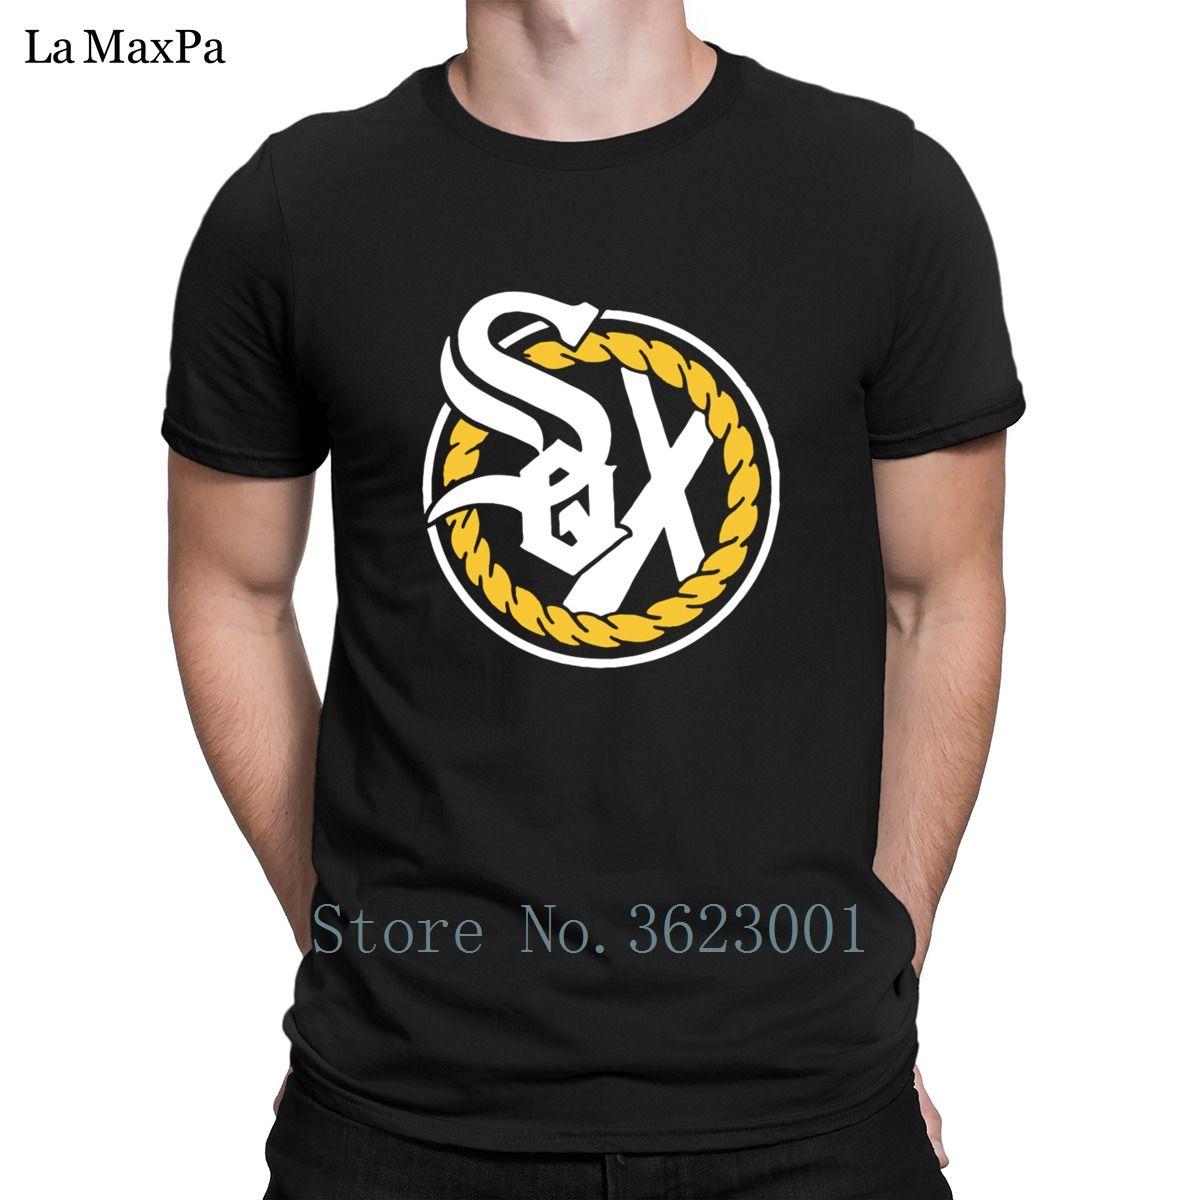 Moda Pictures Camiseta T-shirt para homens Melhor Slim Fit homens camisetas S-3xl camisetas Tops Hiphop Homme Sox